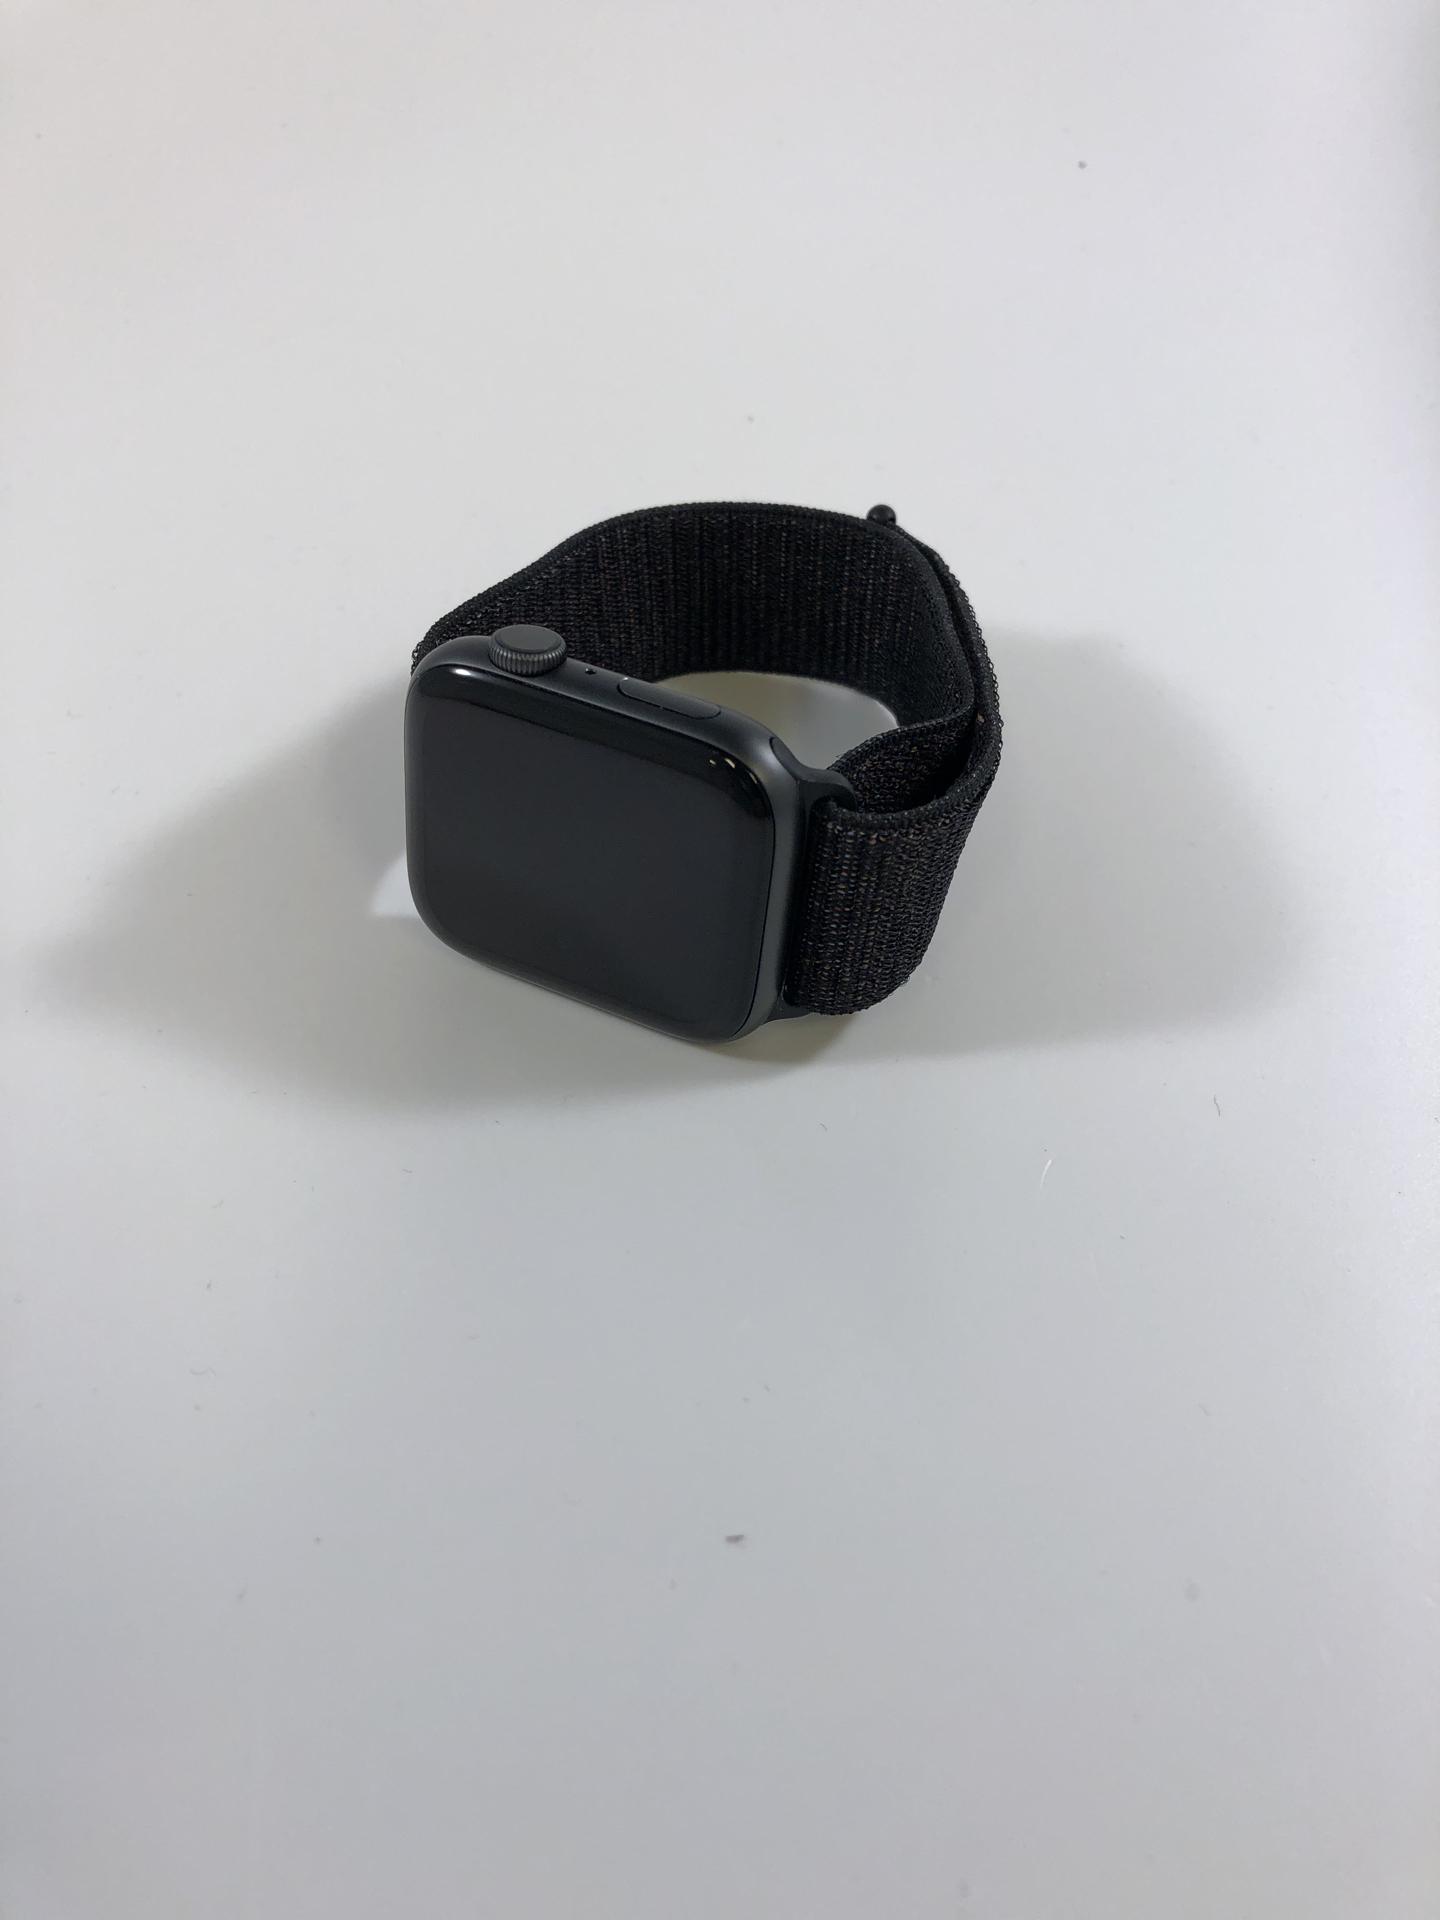 Watch Series 4 Aluminum (44mm), Space Gray, Black Nike Sport Loop, Kuva 1